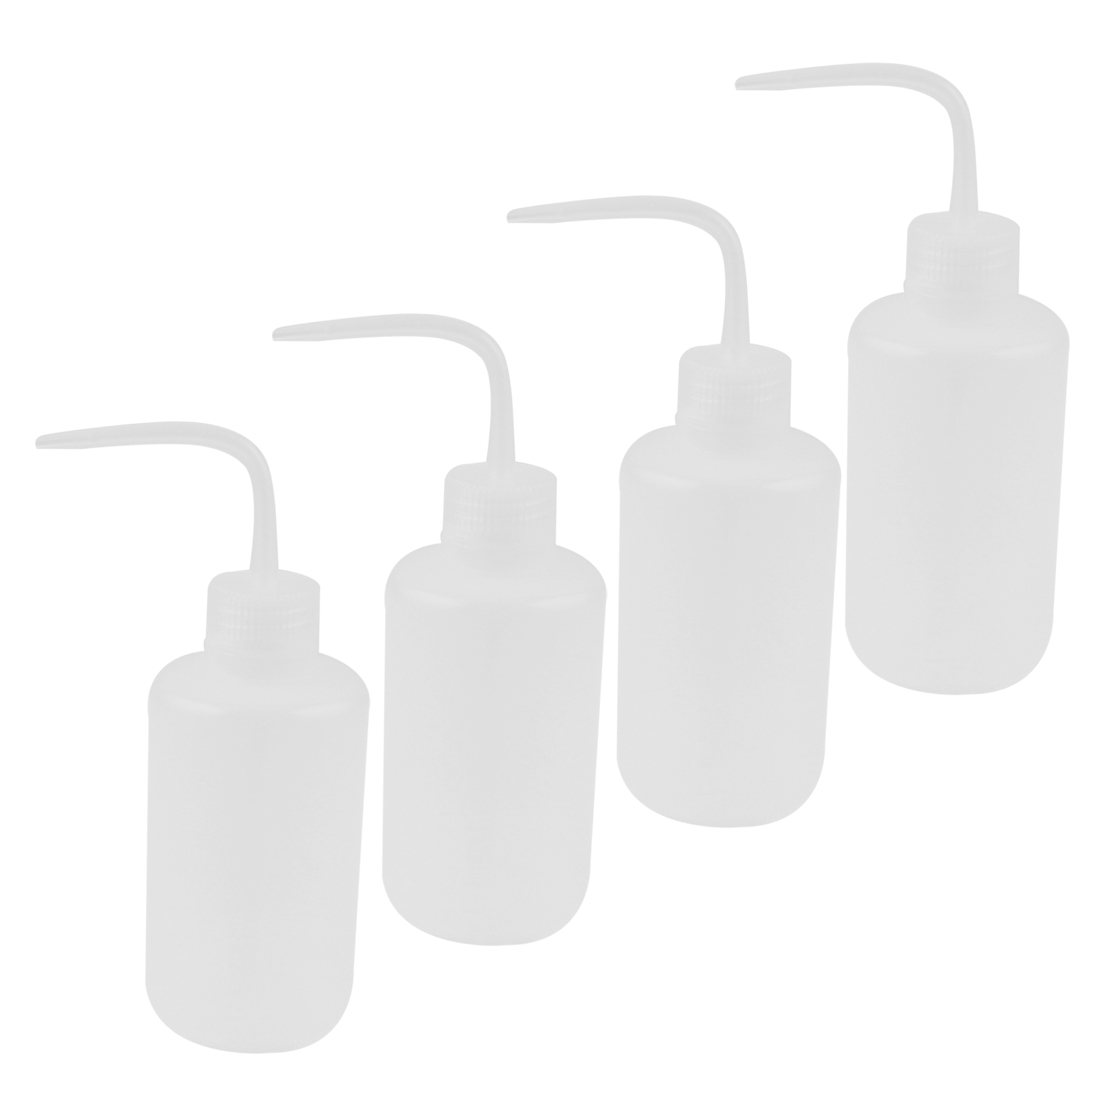 Lab Right Angle Bent Tip Plastic Liquid Storage Squeeze Bottle Dispenser 250mL 4 Pcs